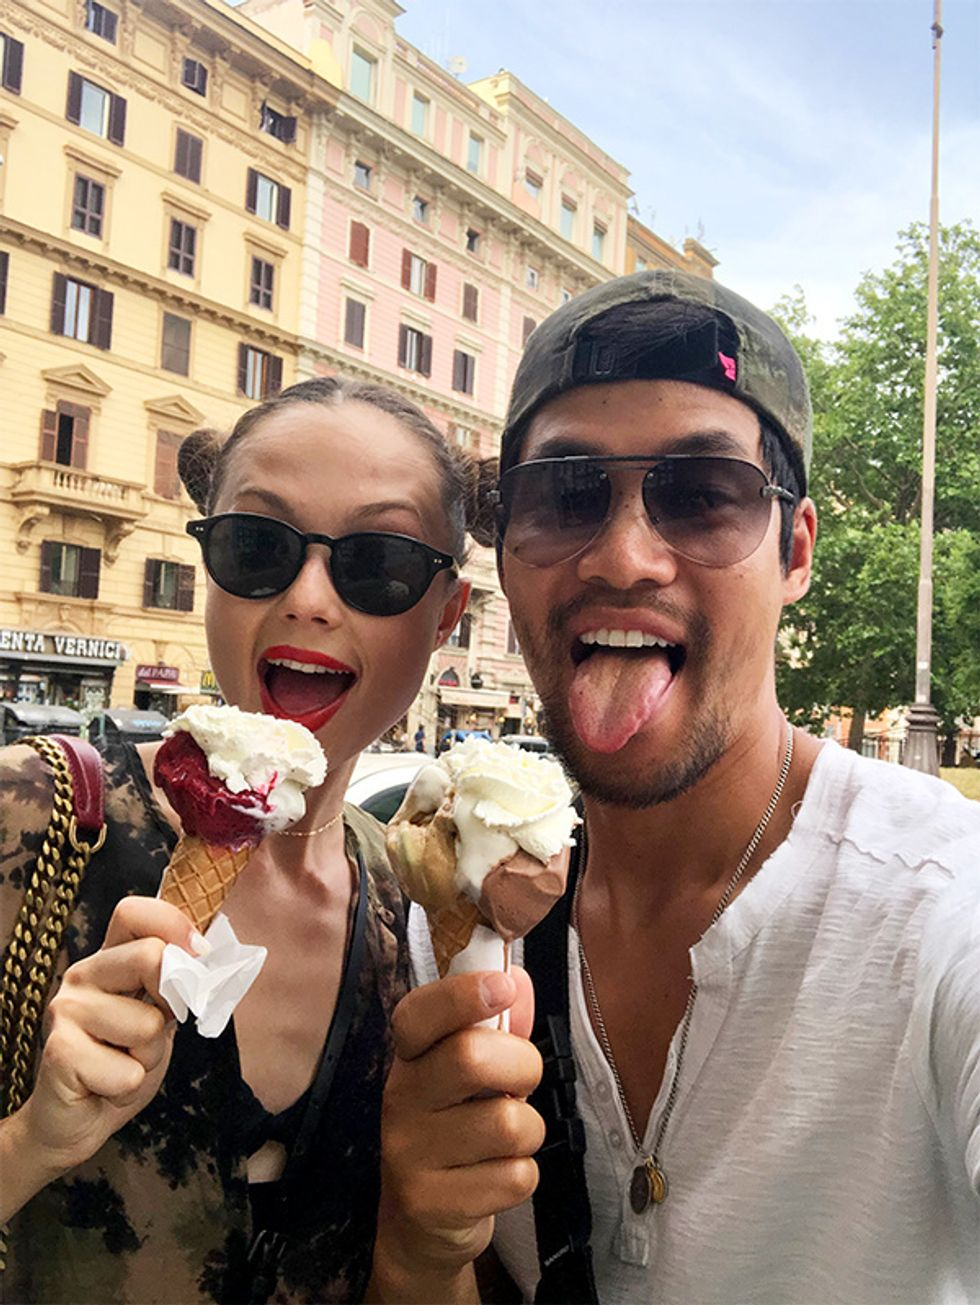 Actor David Lim and wife Marketa Kazdova eating ice cream (gelato) cones in Rome.